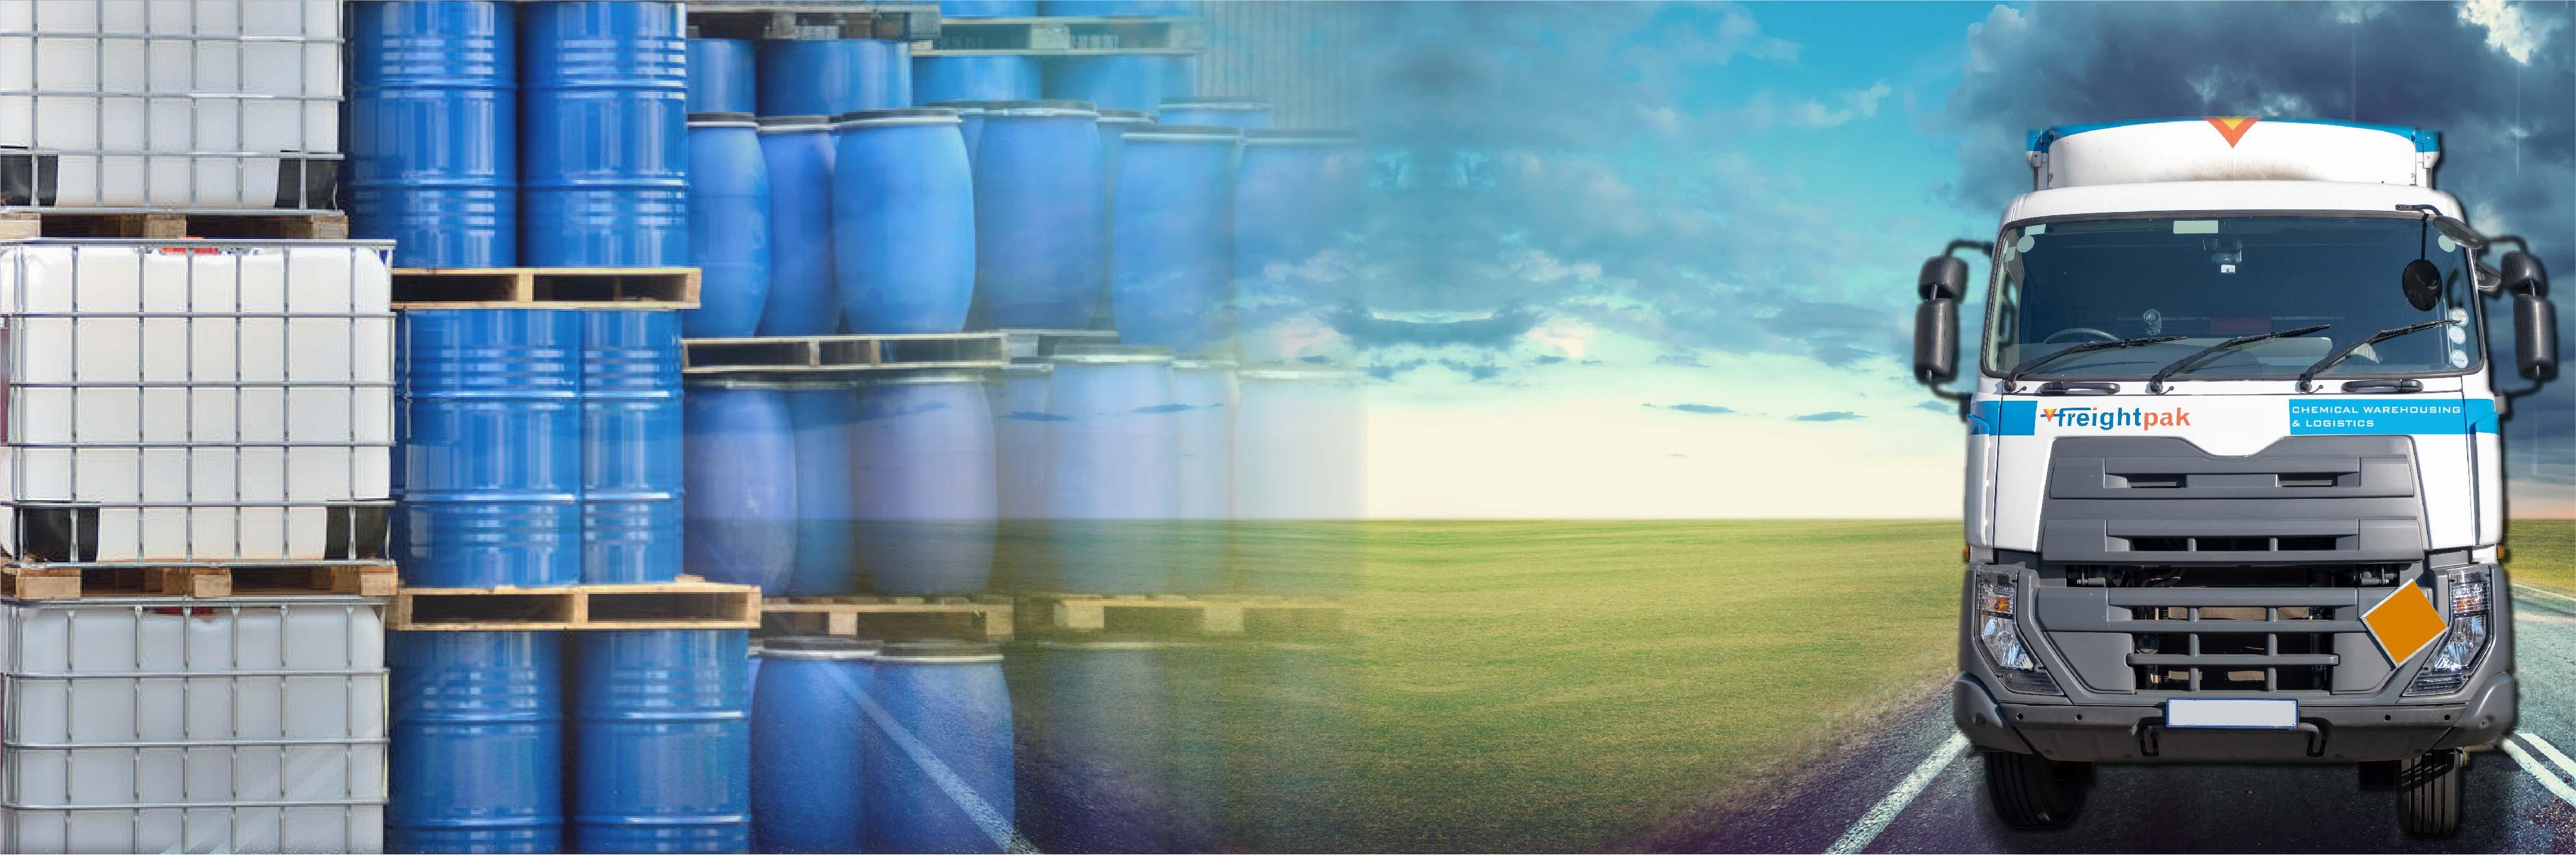 Freightpak Chemical Logistics